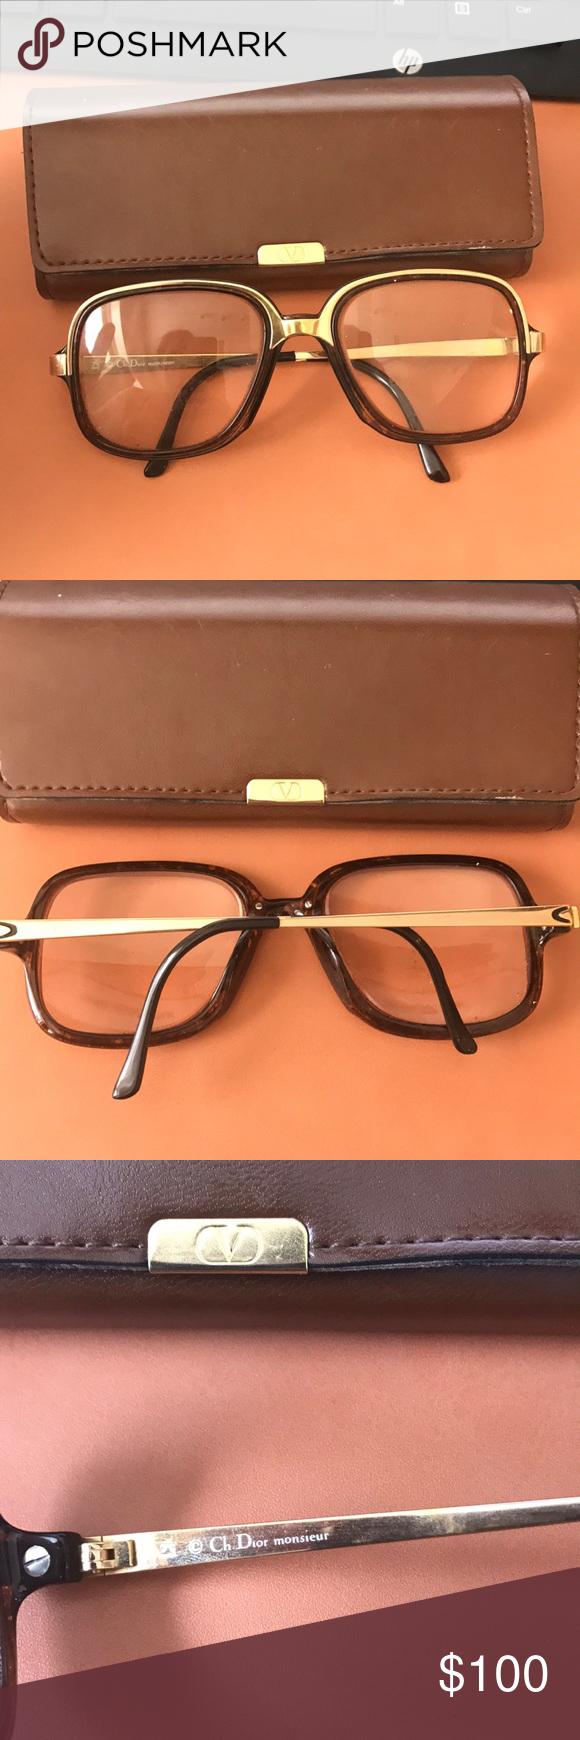 5bc61f91489e Christian Dior monsieur vintage frames Authentic